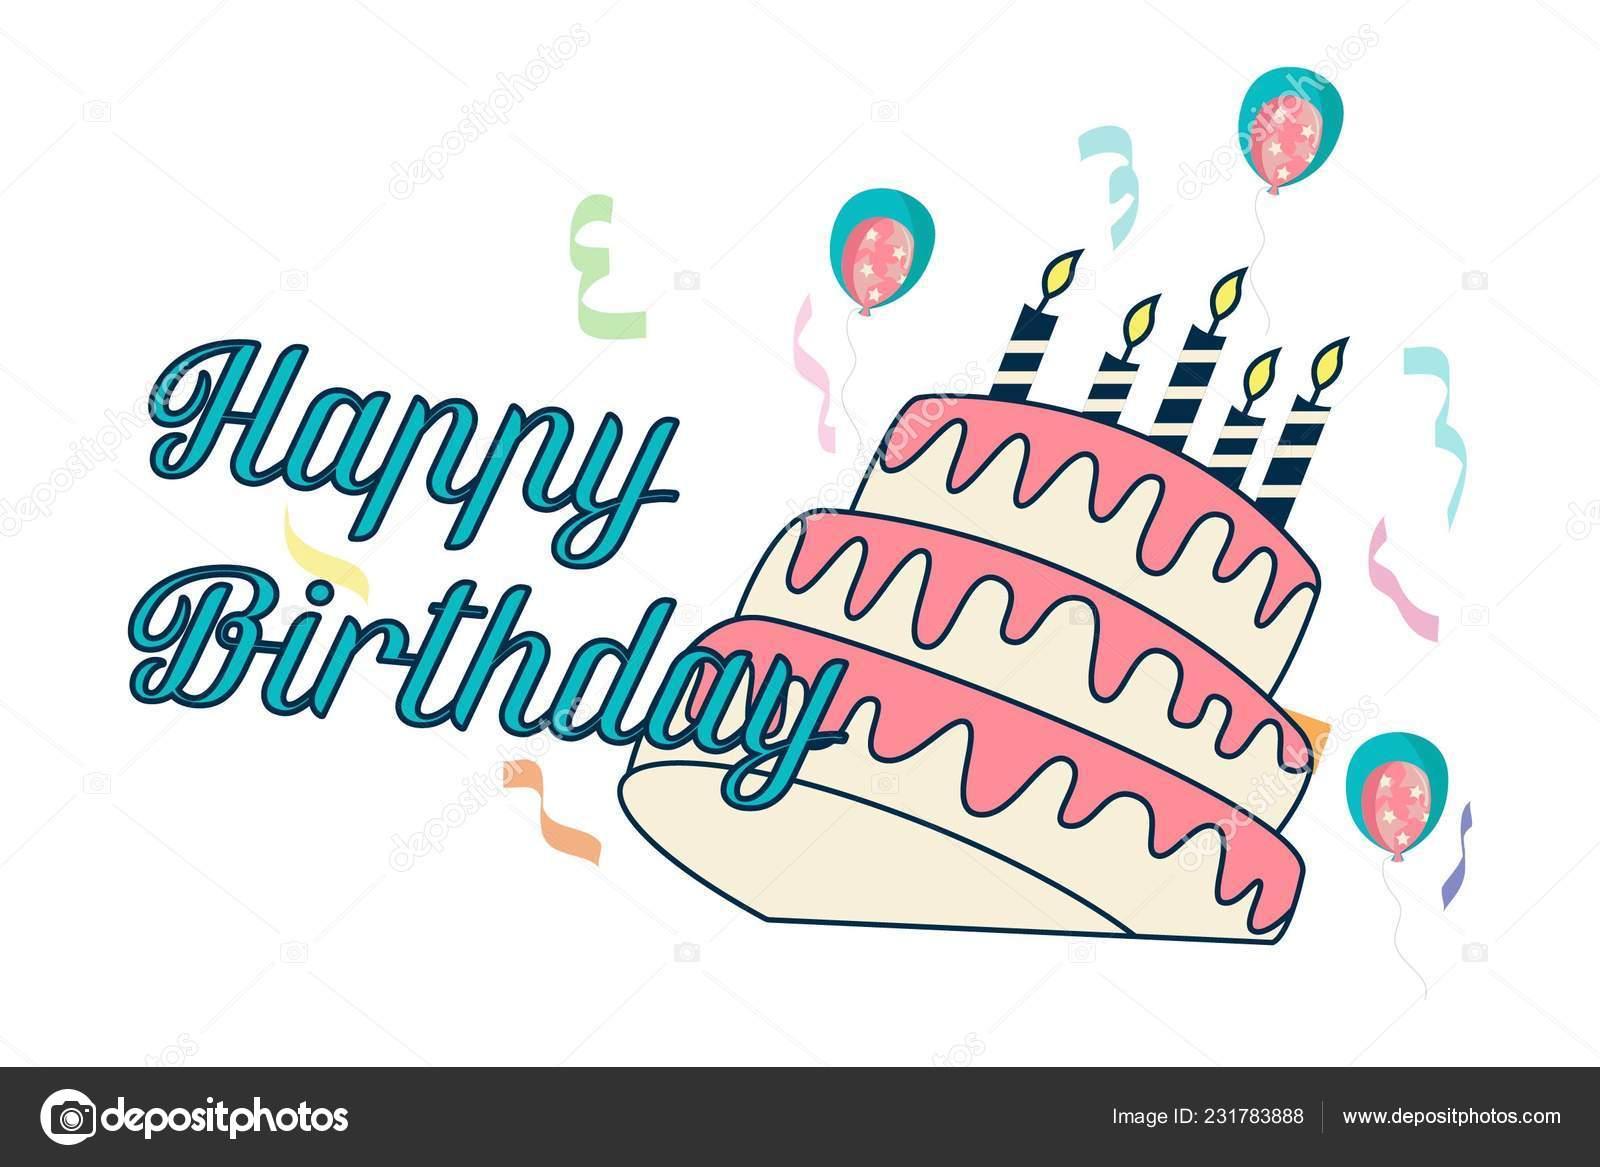 happy birthday sticker cake cute happy birthday sticker banner cake candles vector illustration isolated stock vector c f1digitals 231783888 https depositphotos com 231783888 stock illustration cute happy birthday sticker banner html